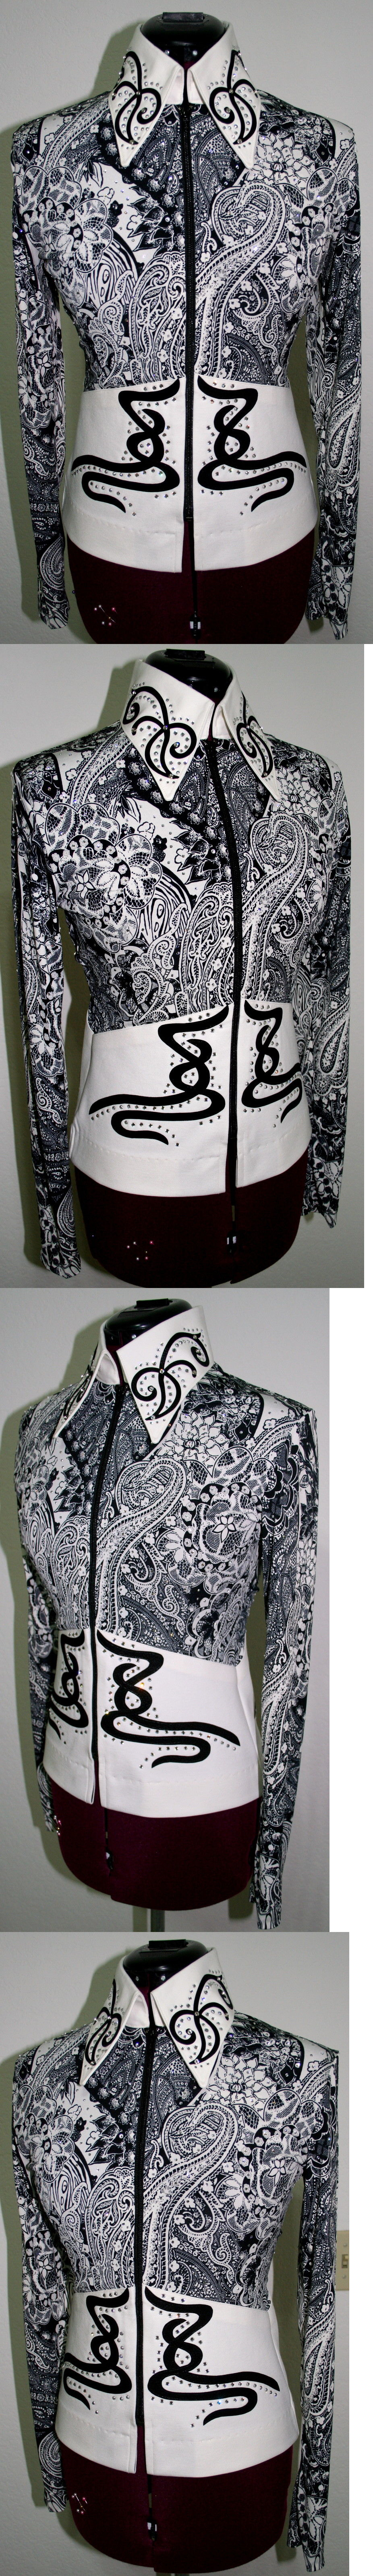 Western Show Shirts 183370: New Wannagoslow Showmanship Horsemanship, Pleasure, Rail, Horse Show Trail Nr -> BUY IT NOW ONLY: $475 on eBay!